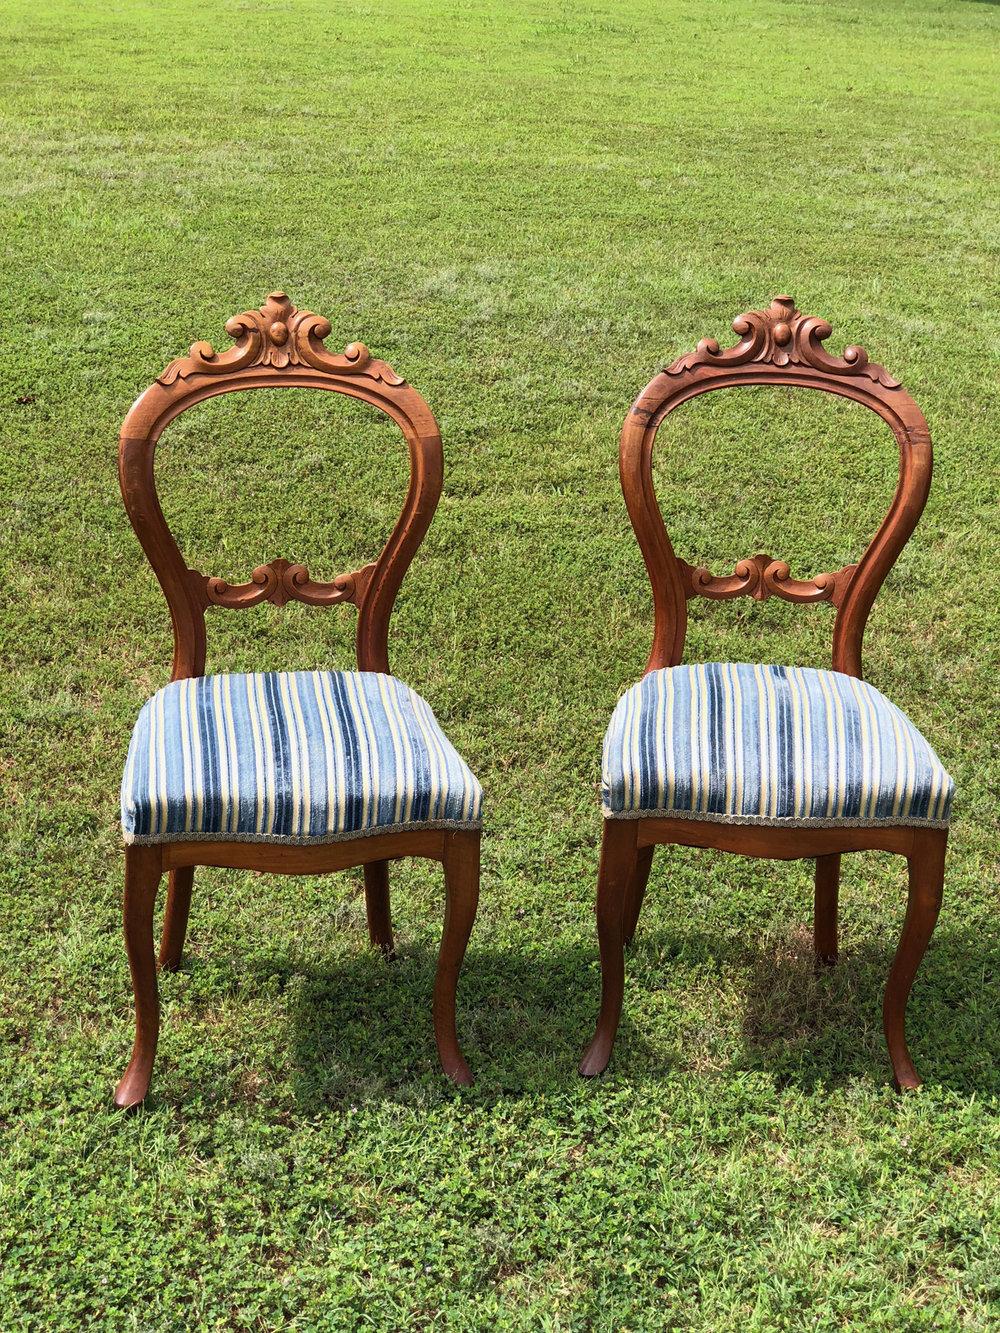 Charleston Chairs~Rental $25 each